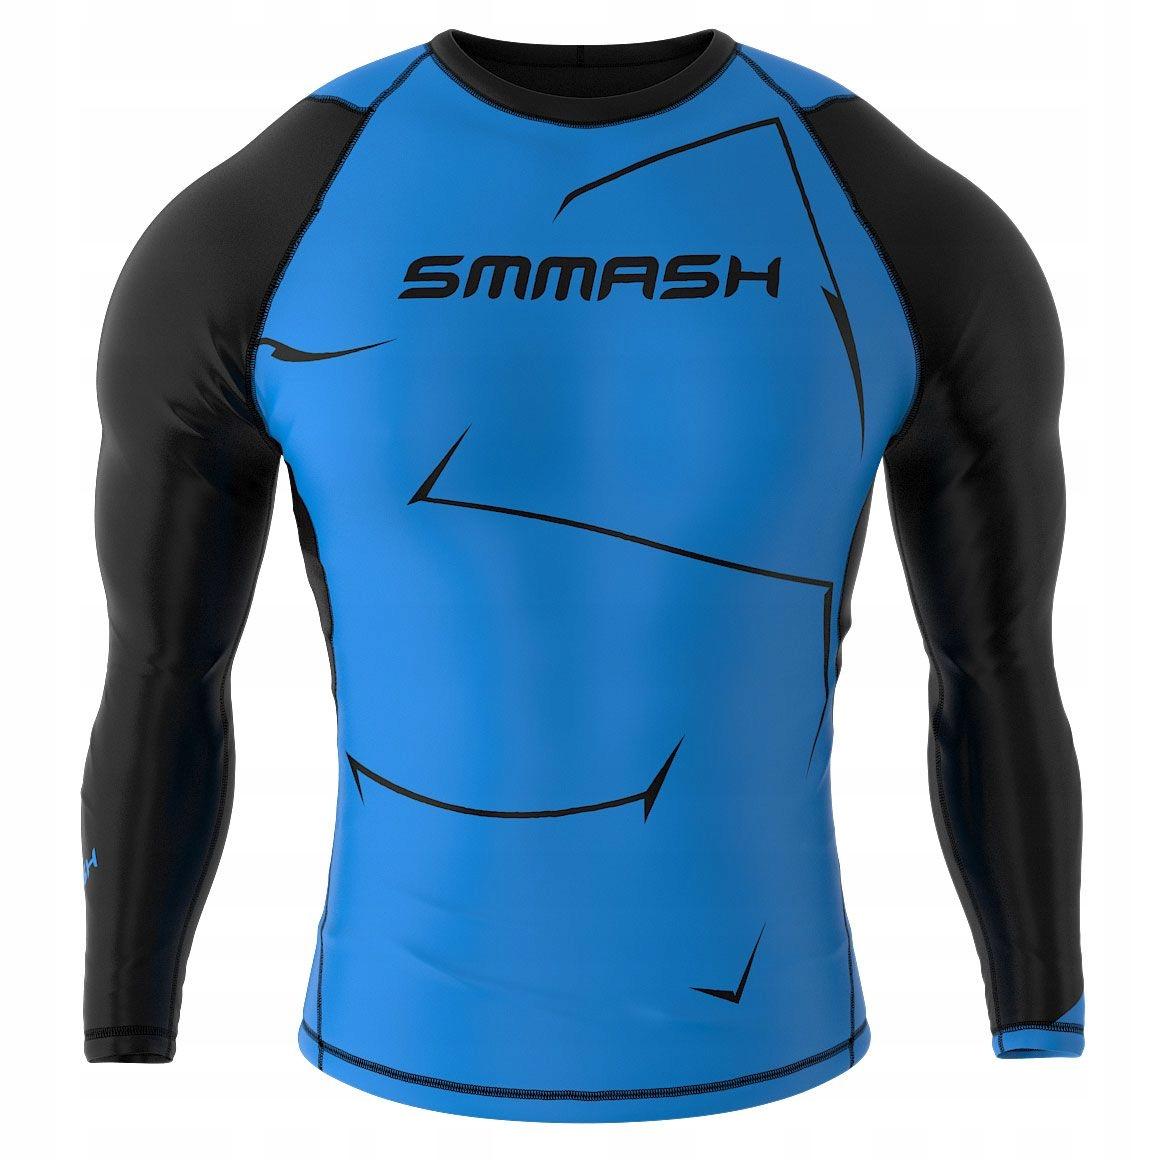 SMMASH koszulka rashguard Compression cross mma #M